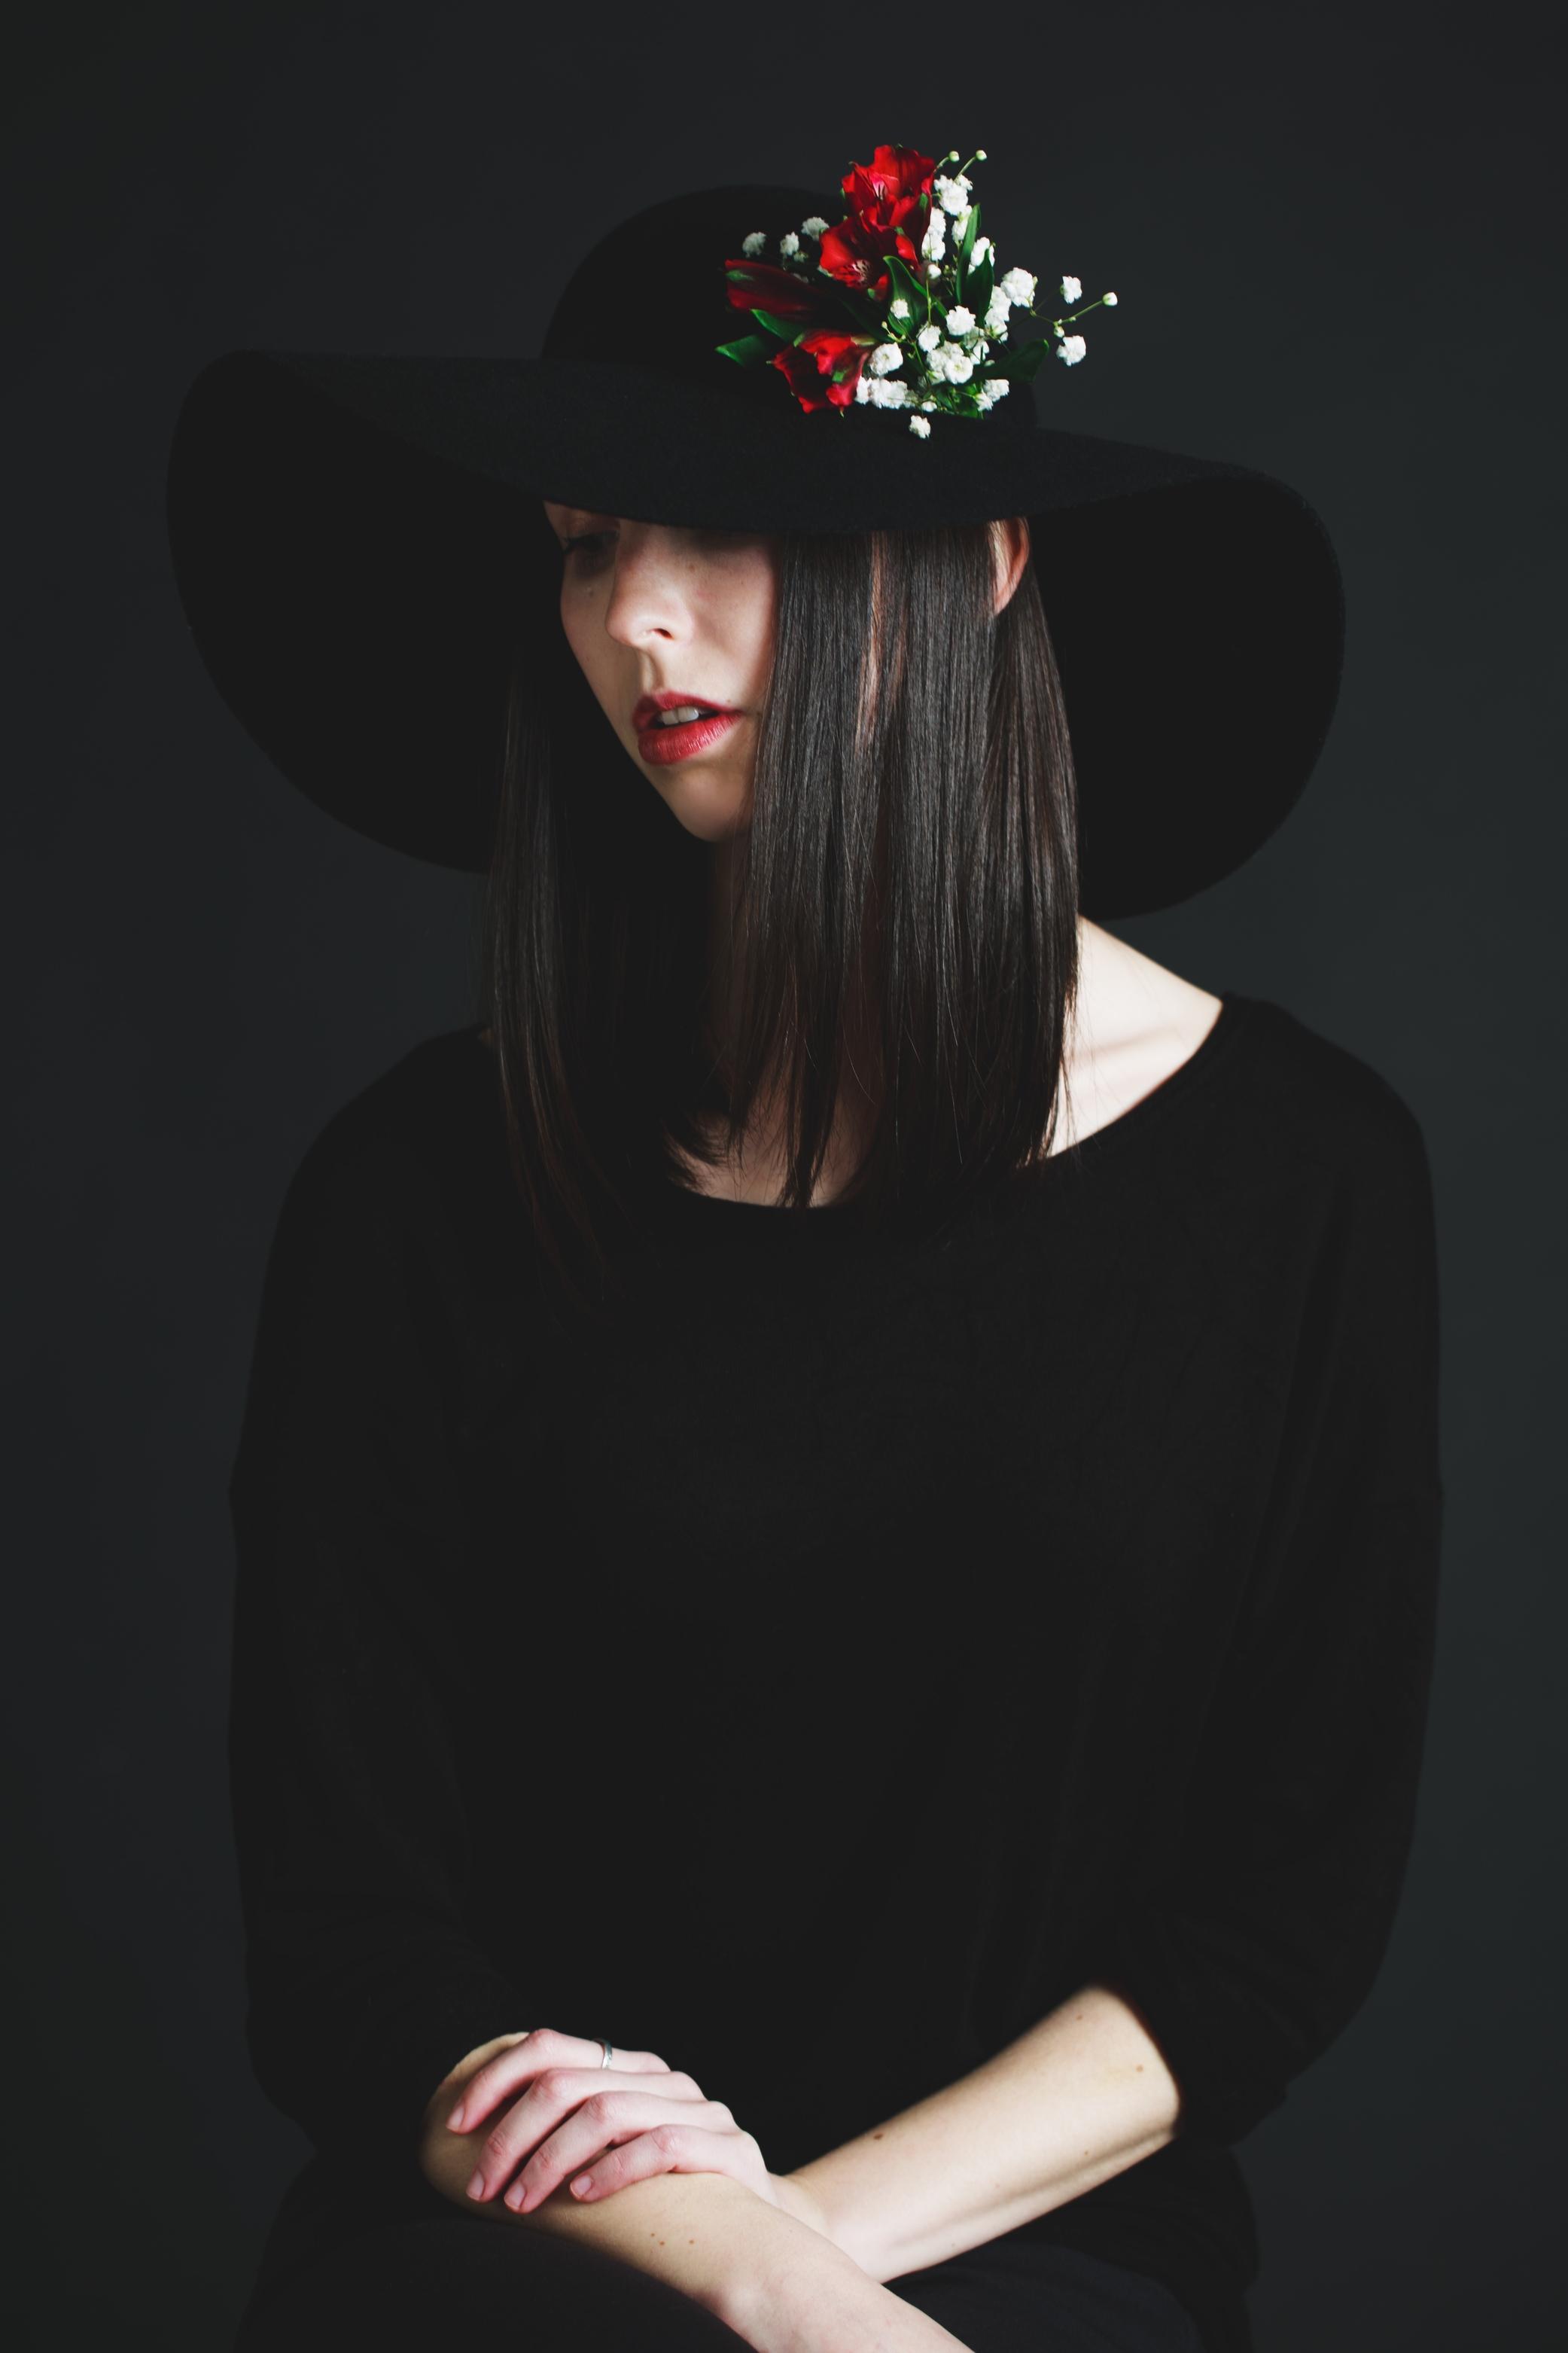 machiavelli_hat2.jpg